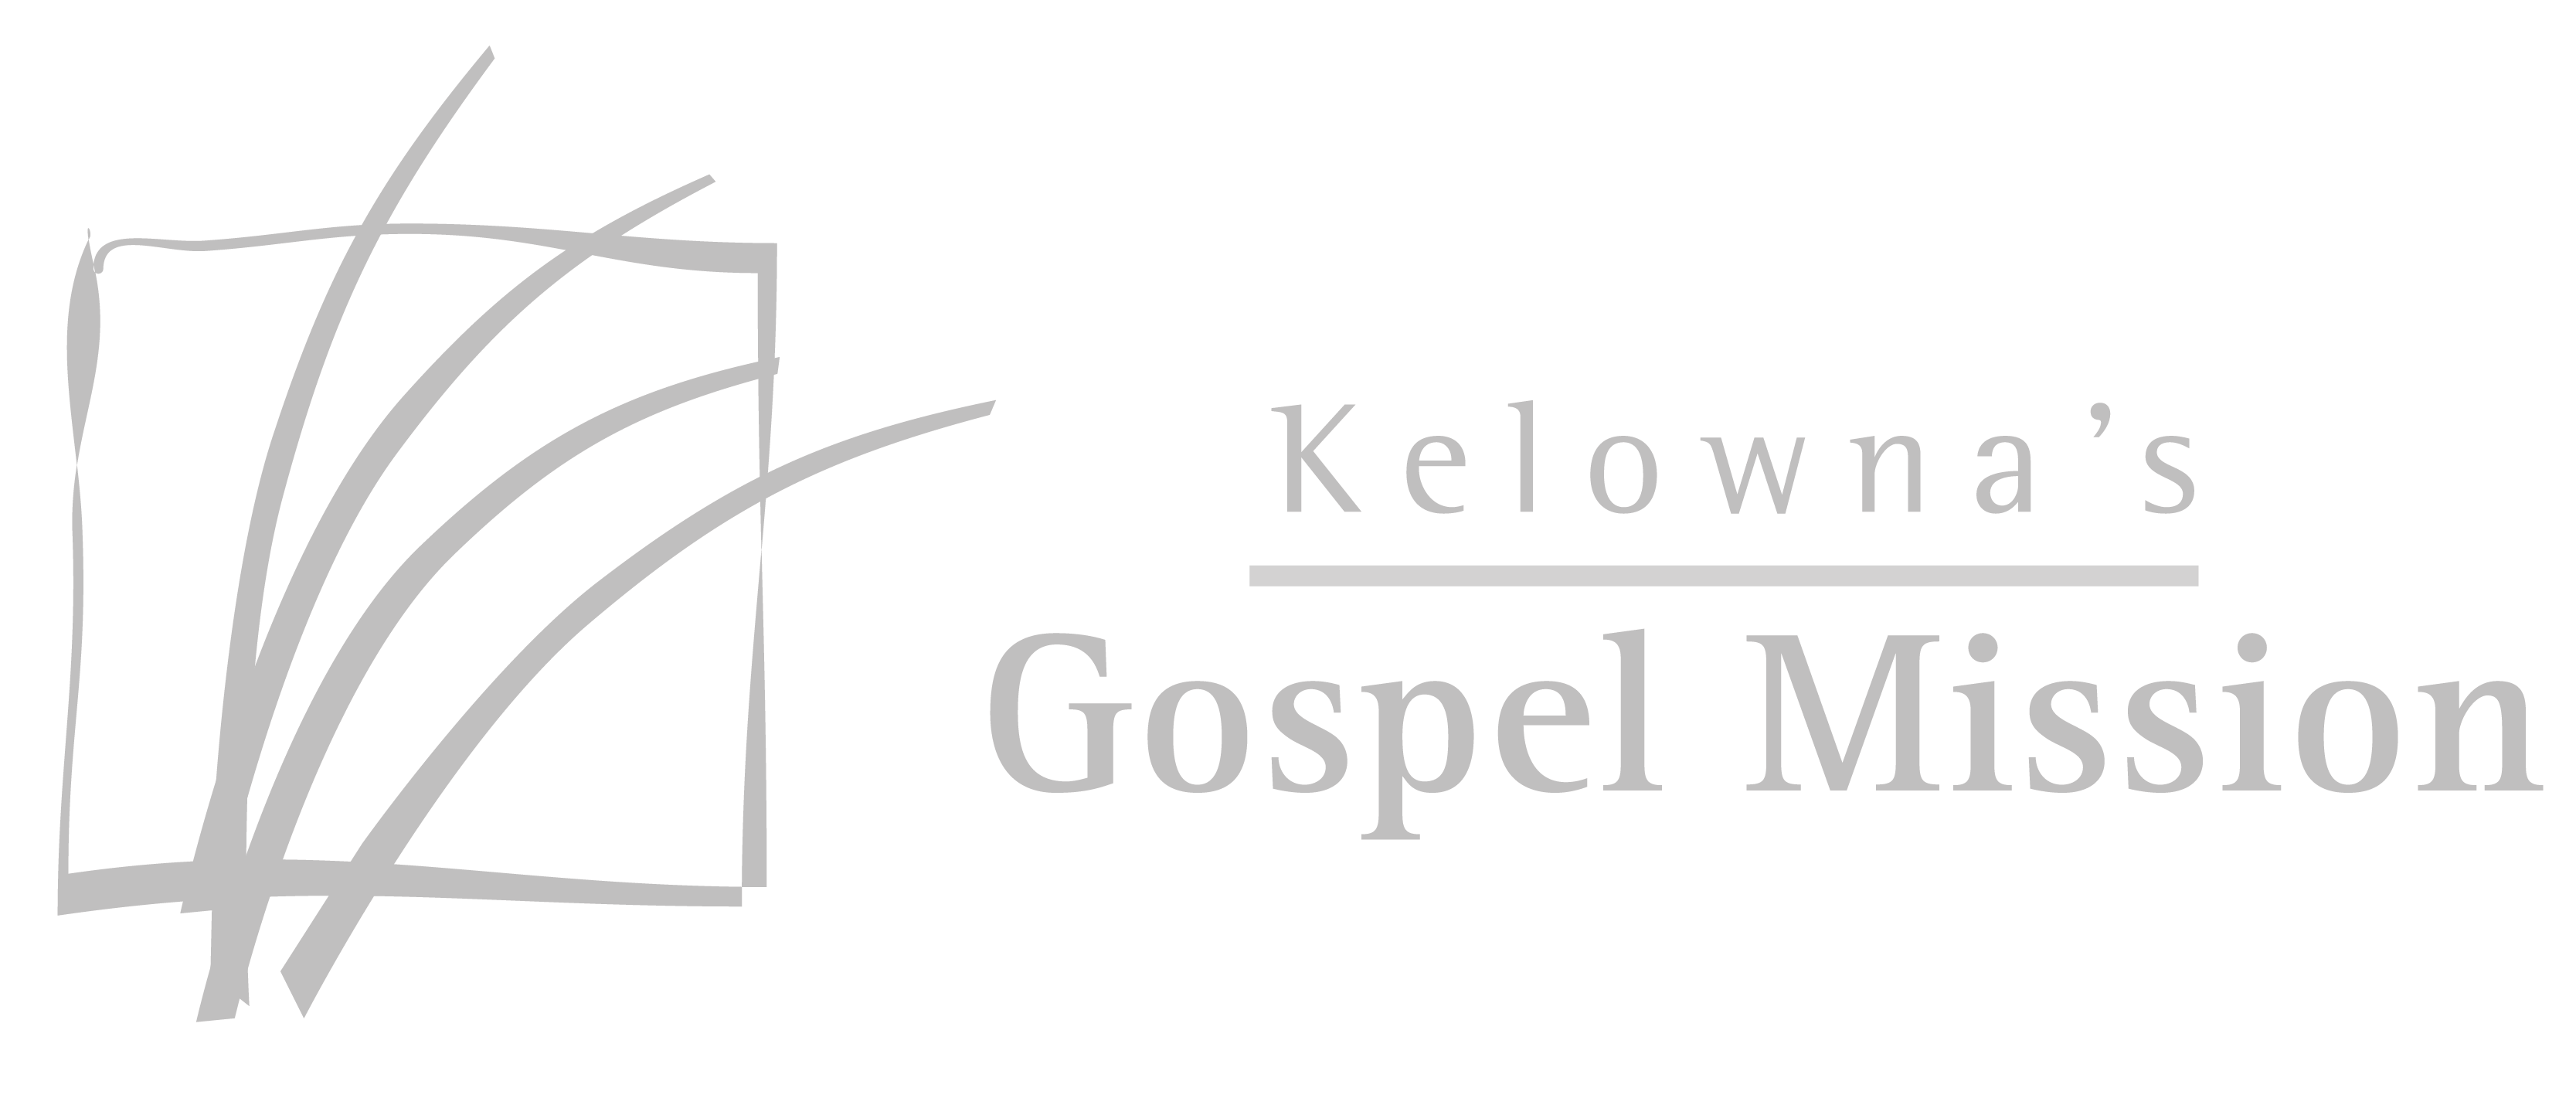 Kelowna's Gospel Mission Logo